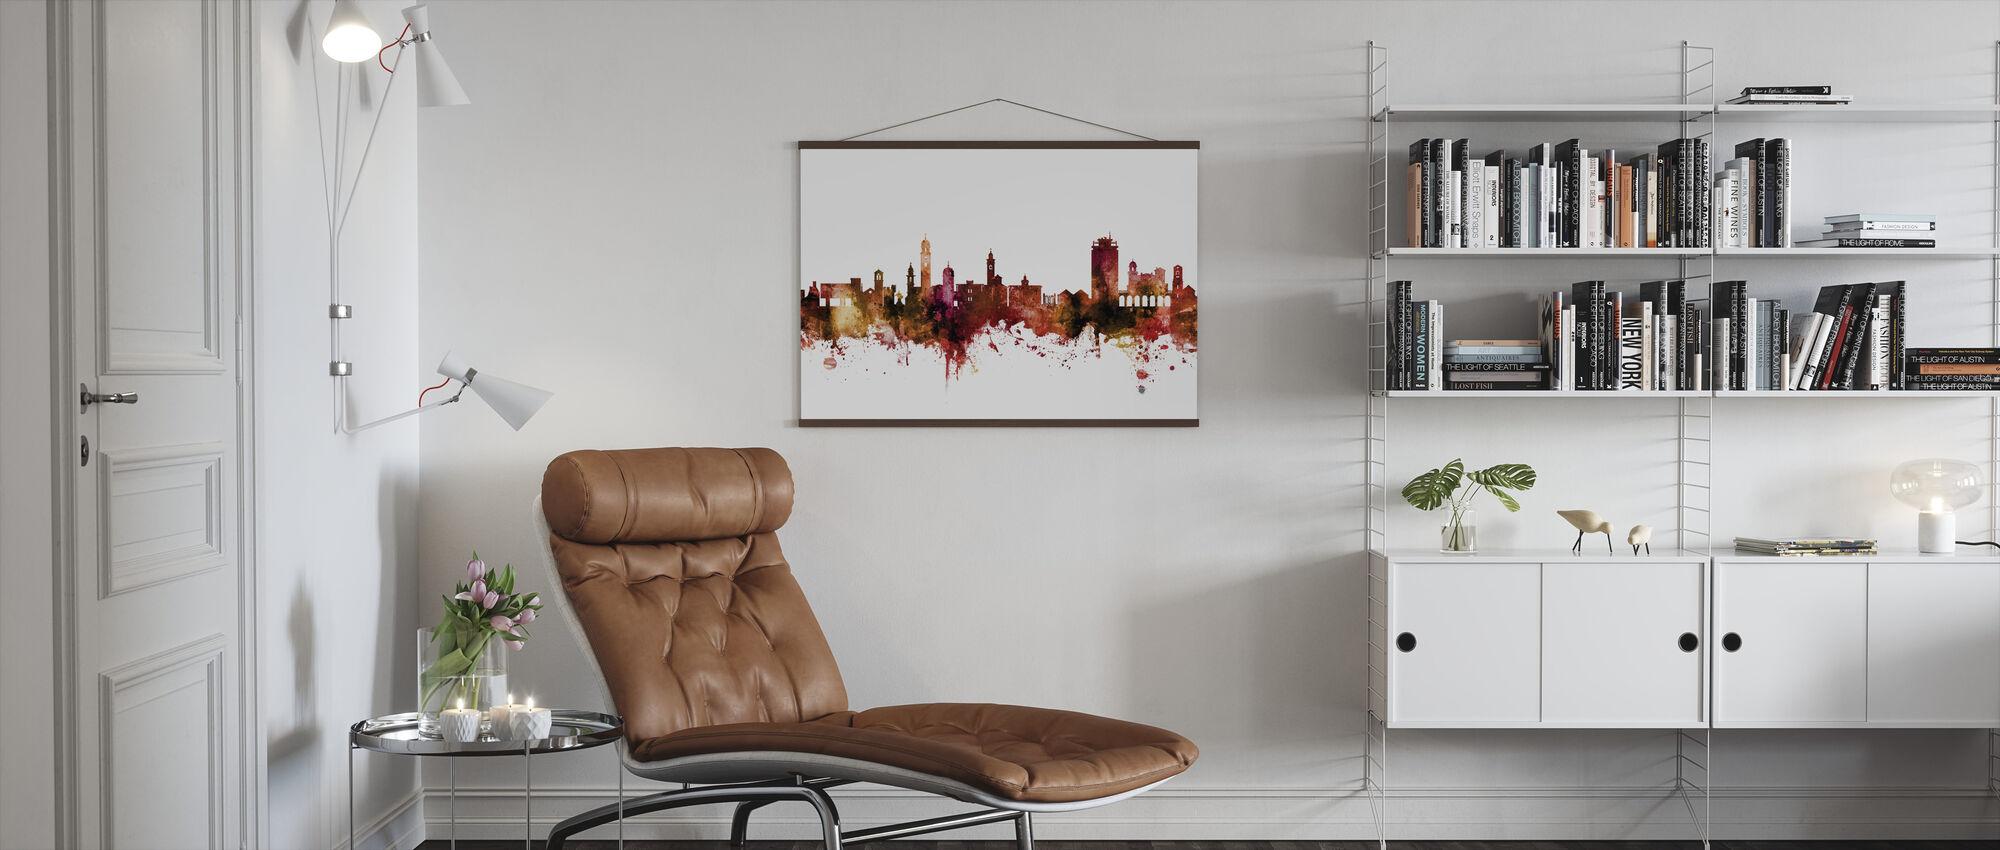 Lugano Zwitserland Skyline - Poster - Woonkamer